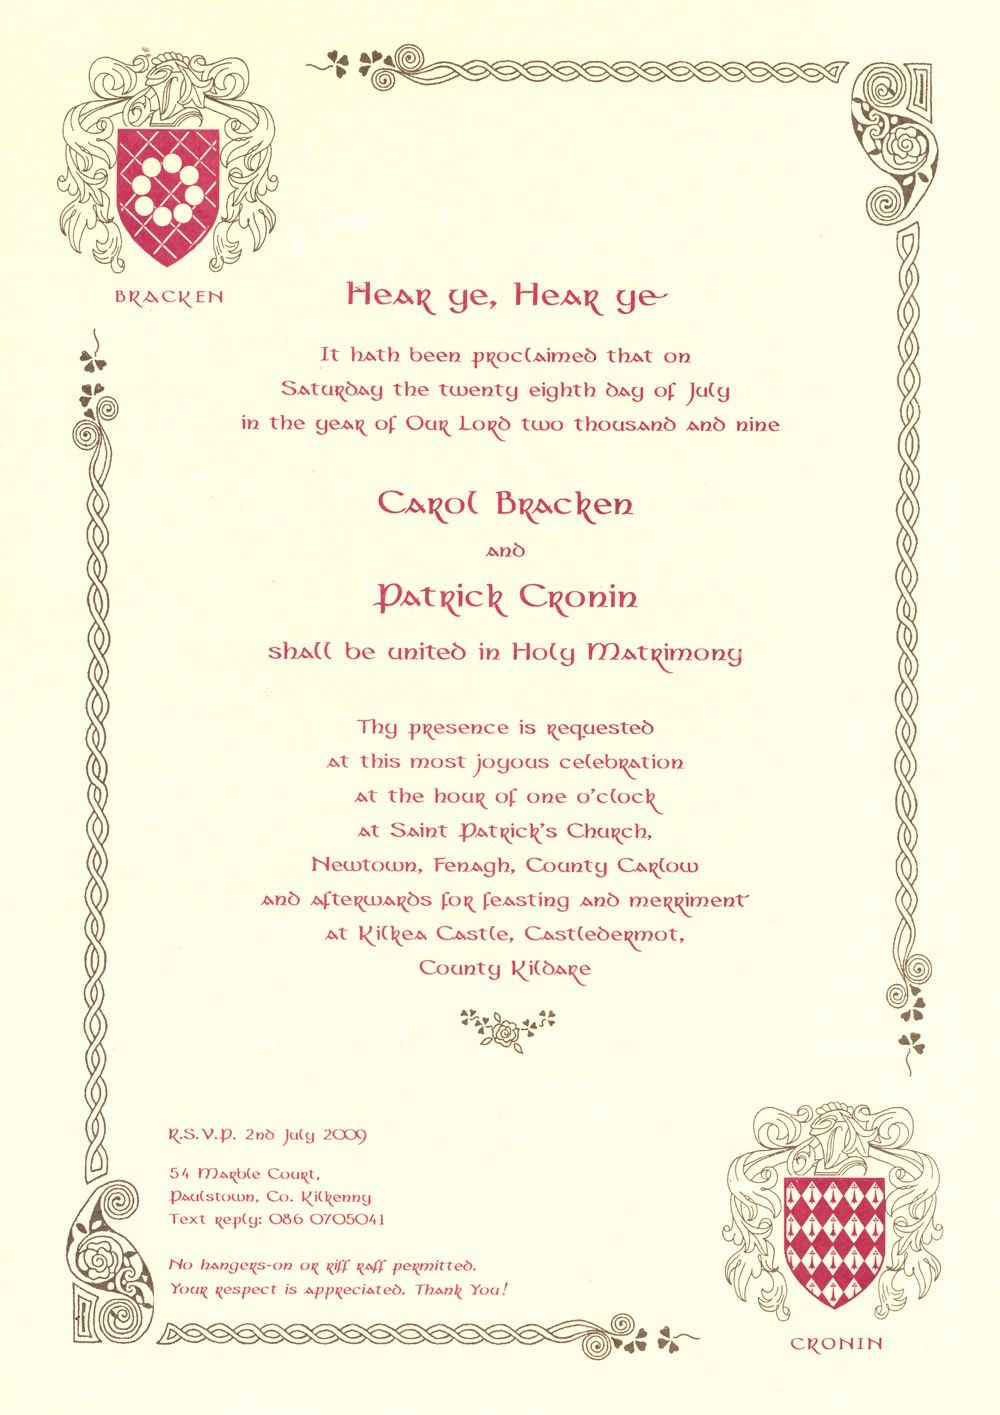 medieval wedding invitations wording - Google Search | wedding ...